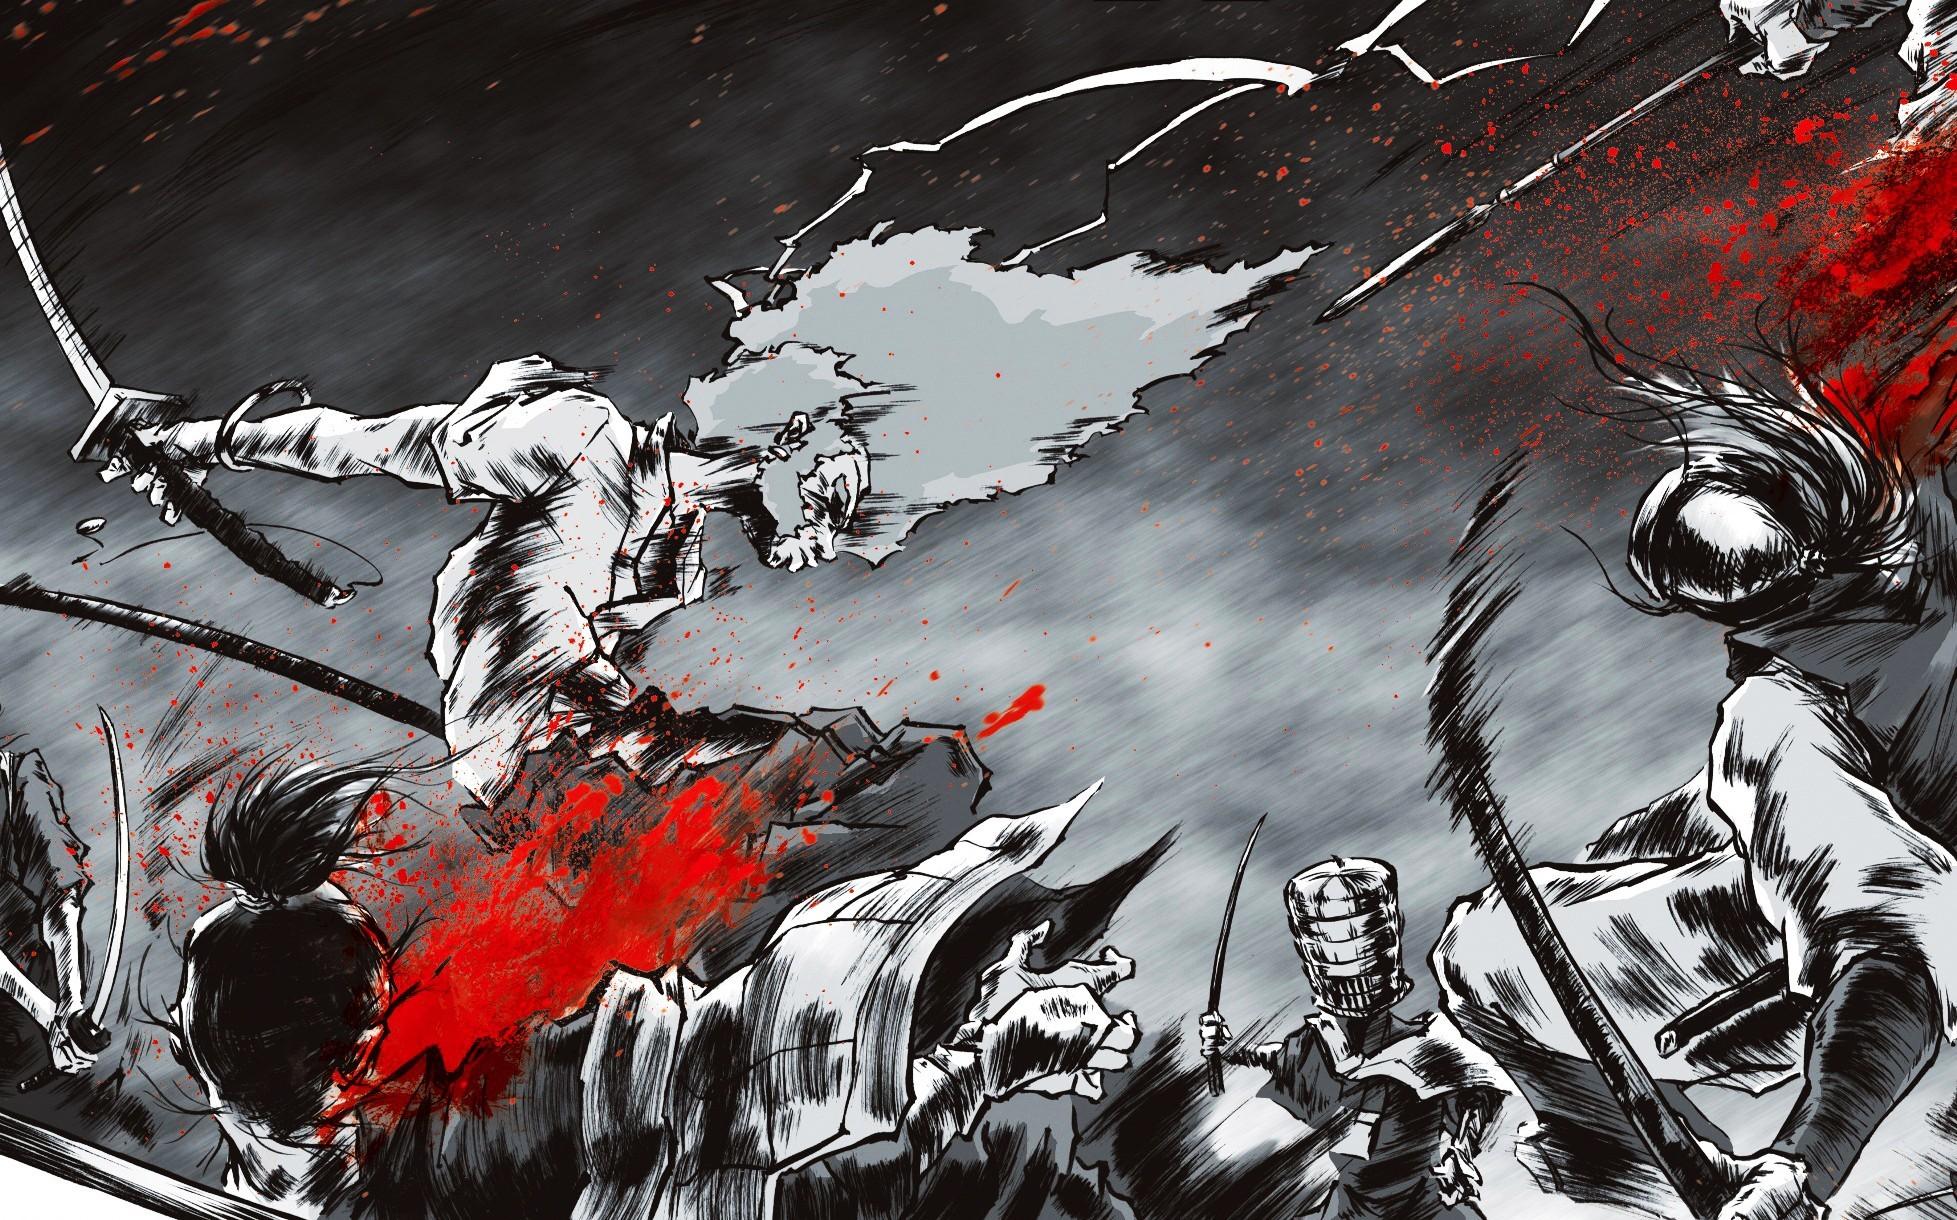 Epic Samurai Hd Wallpaper 1080p